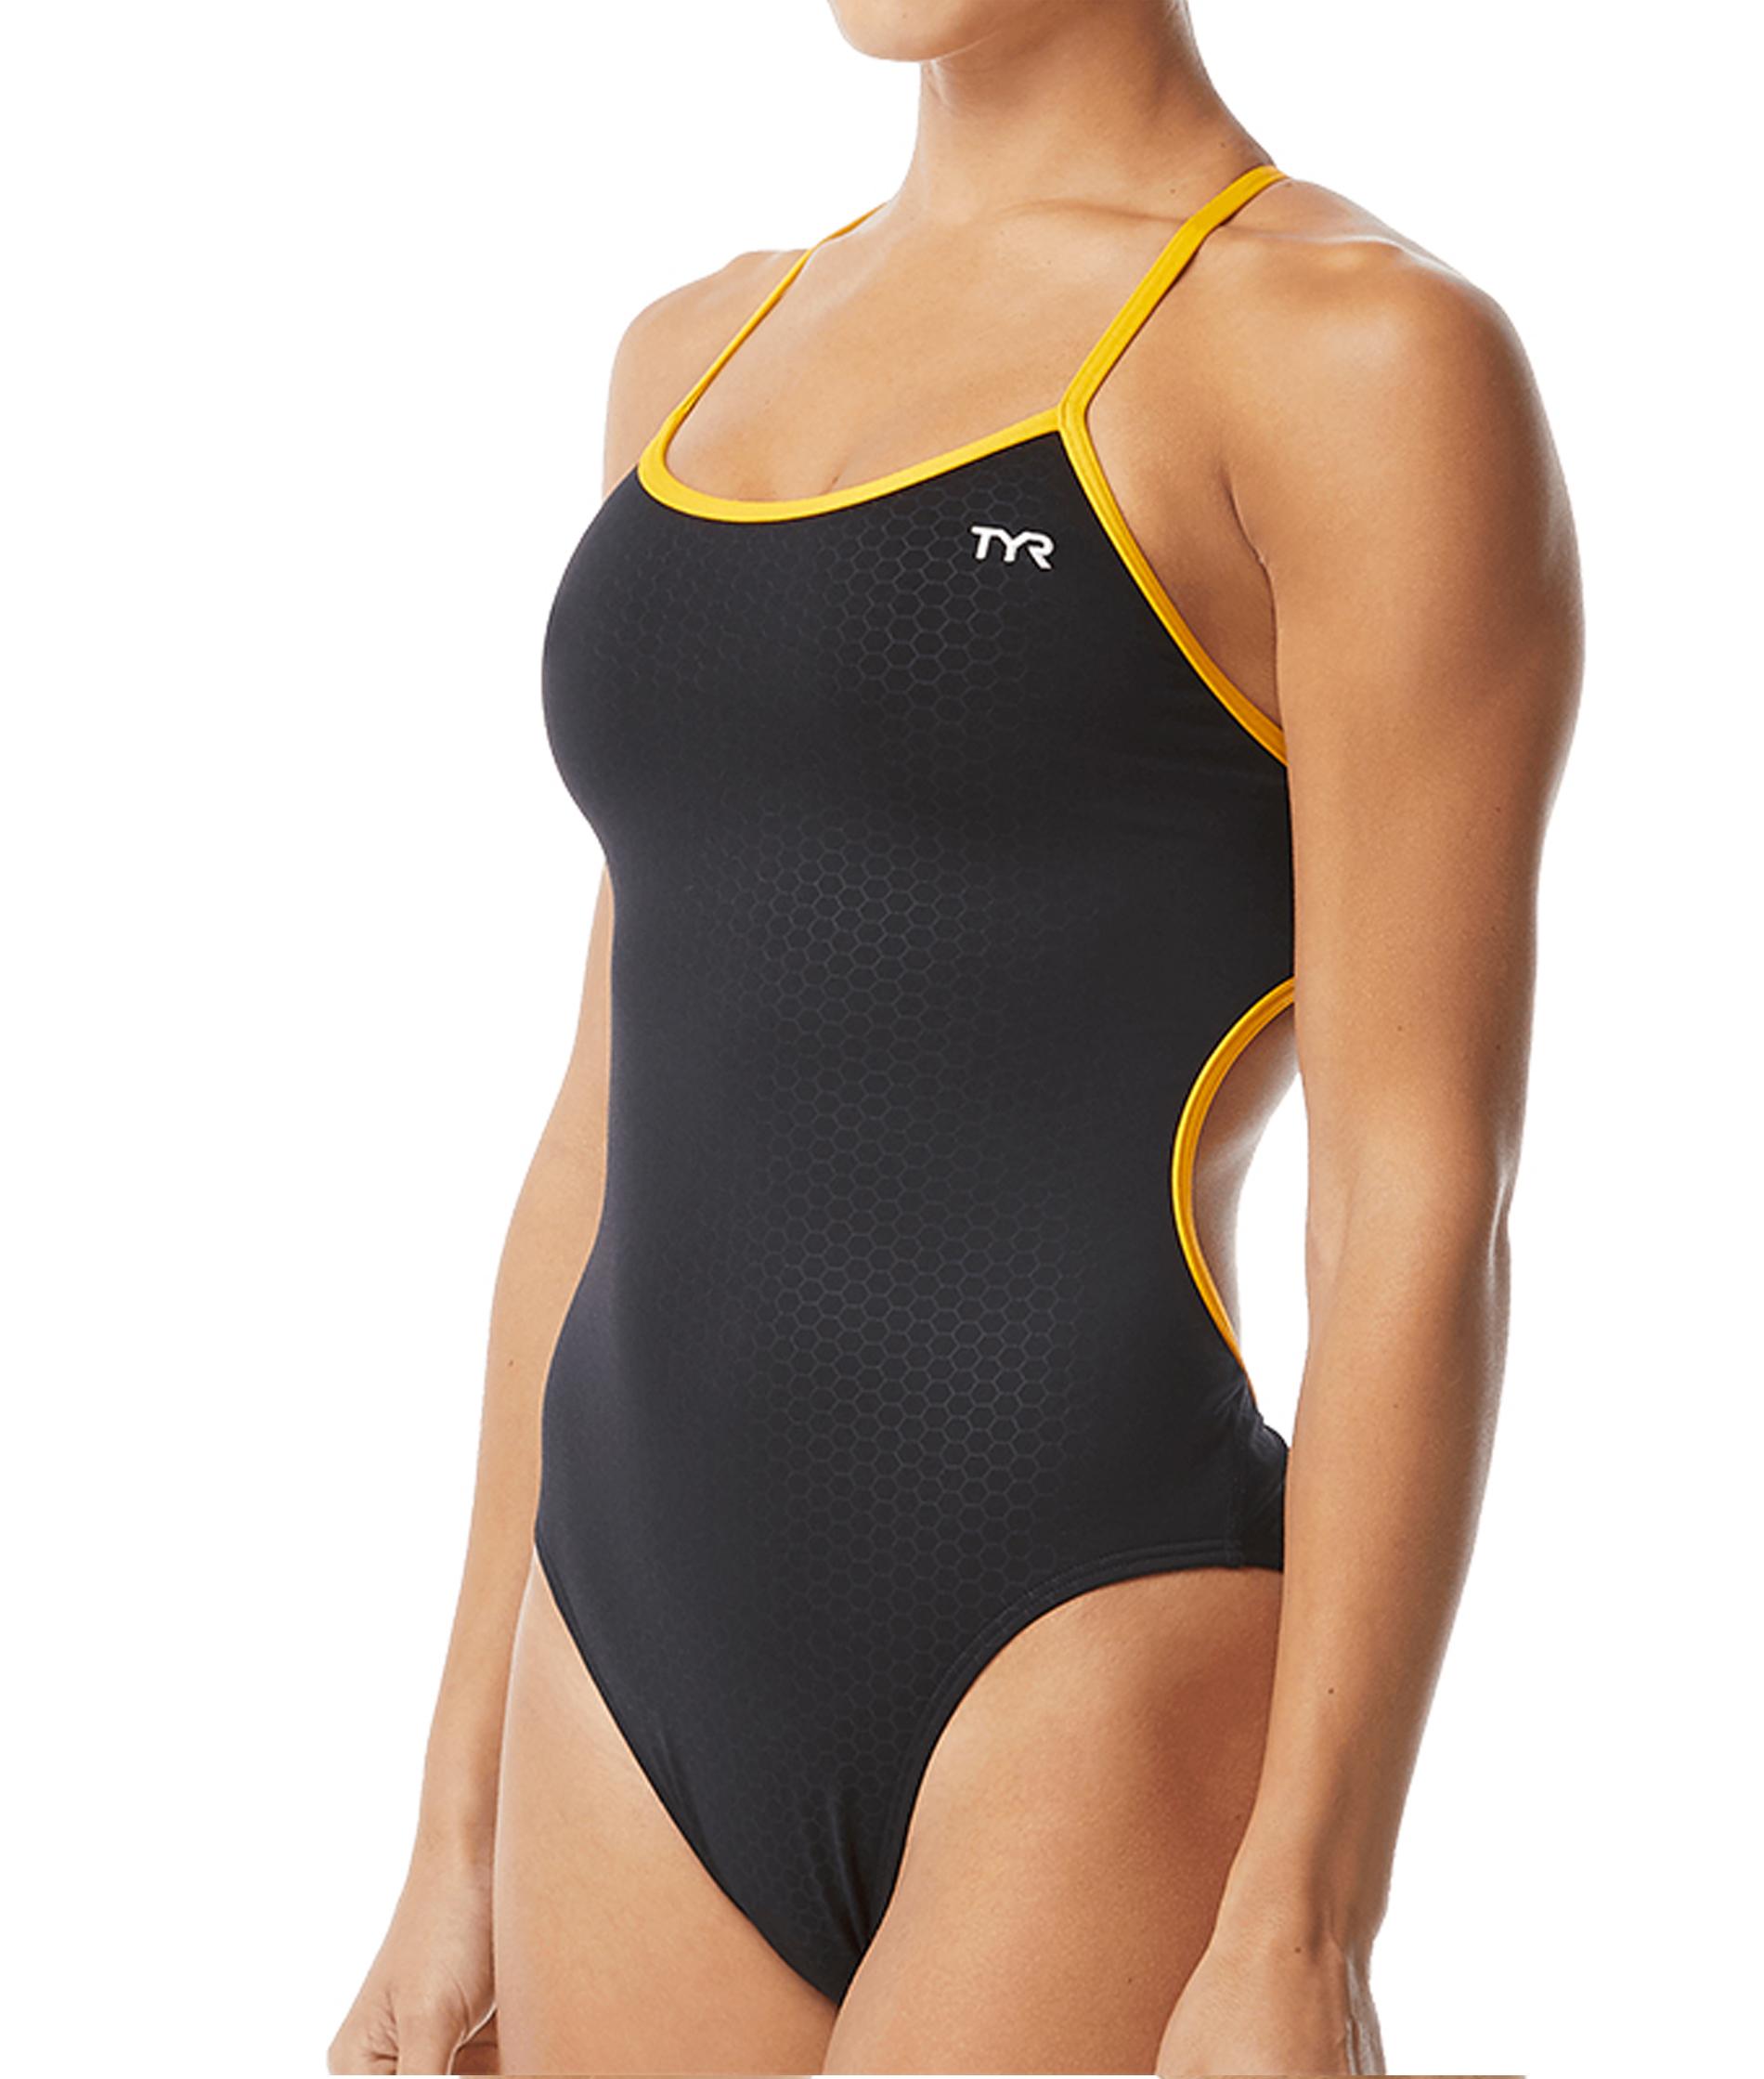 TYR Womens Hexa Trinityfit Swimsuit